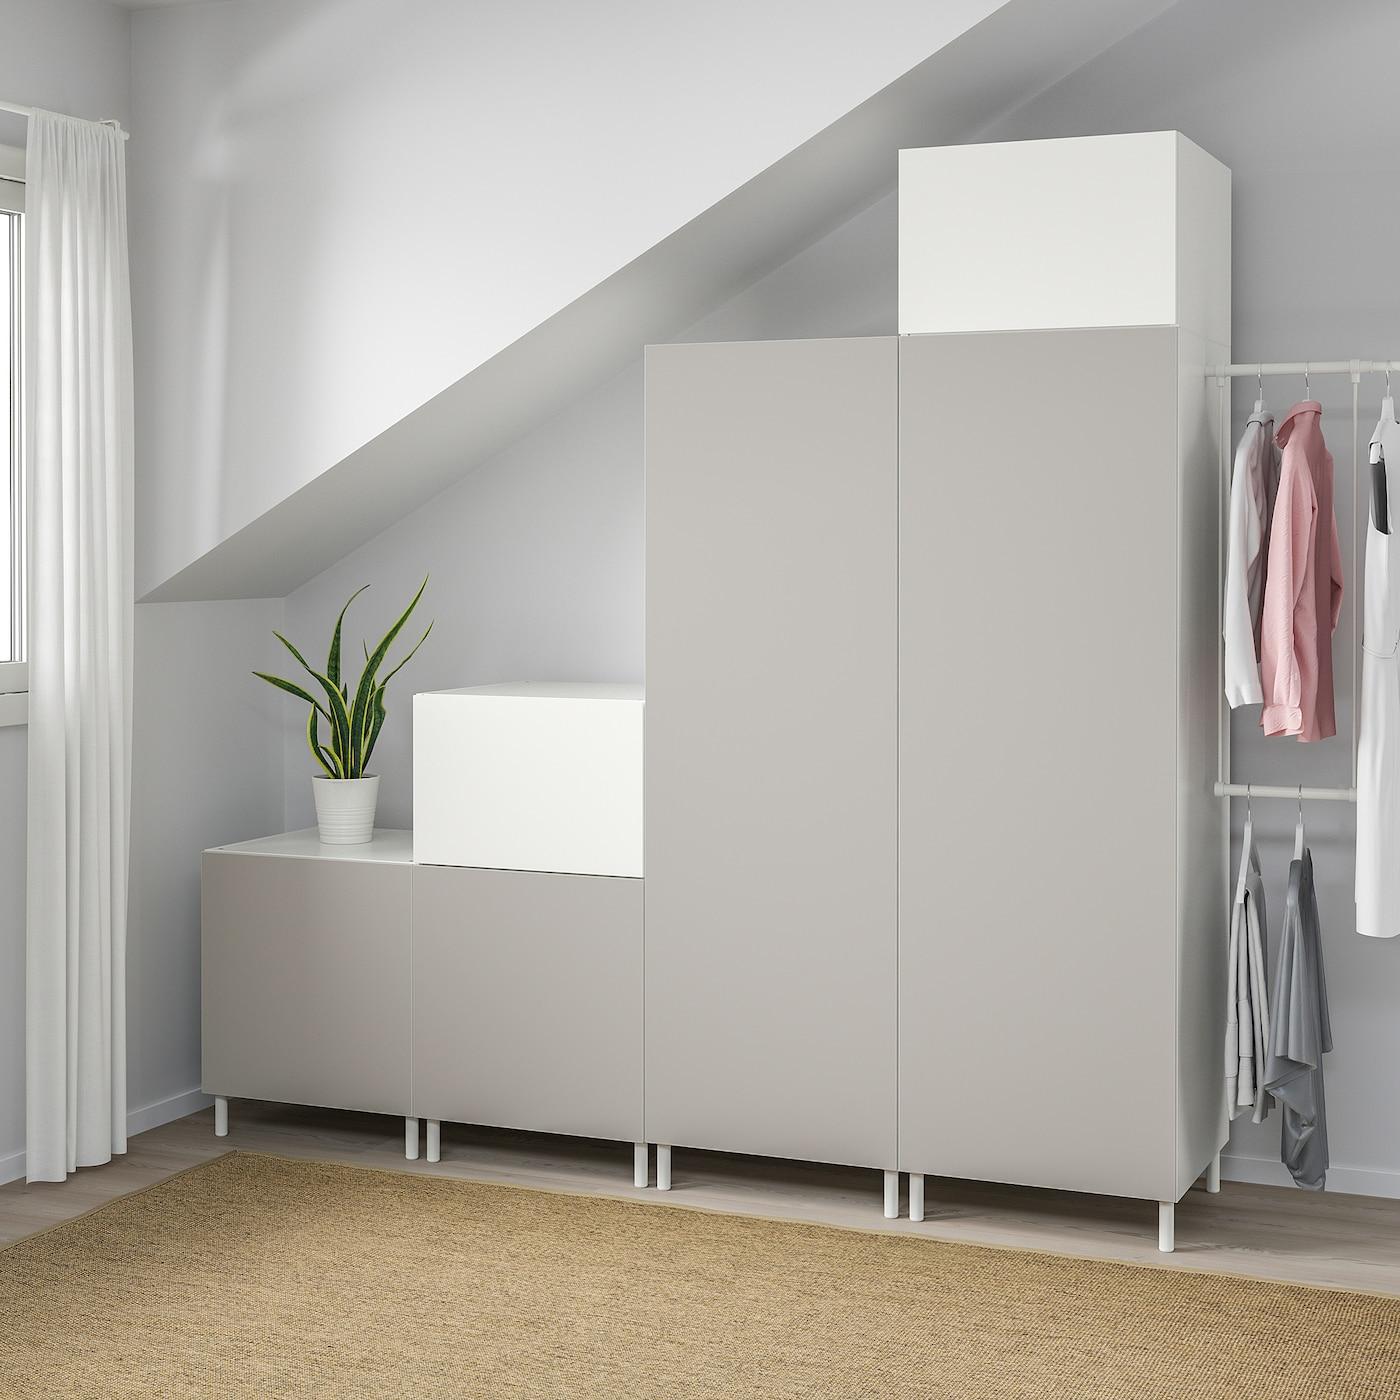 PLATSA Garderob, vit Fonnes/Skatval ljusgrå, 275-300x57x231 cm